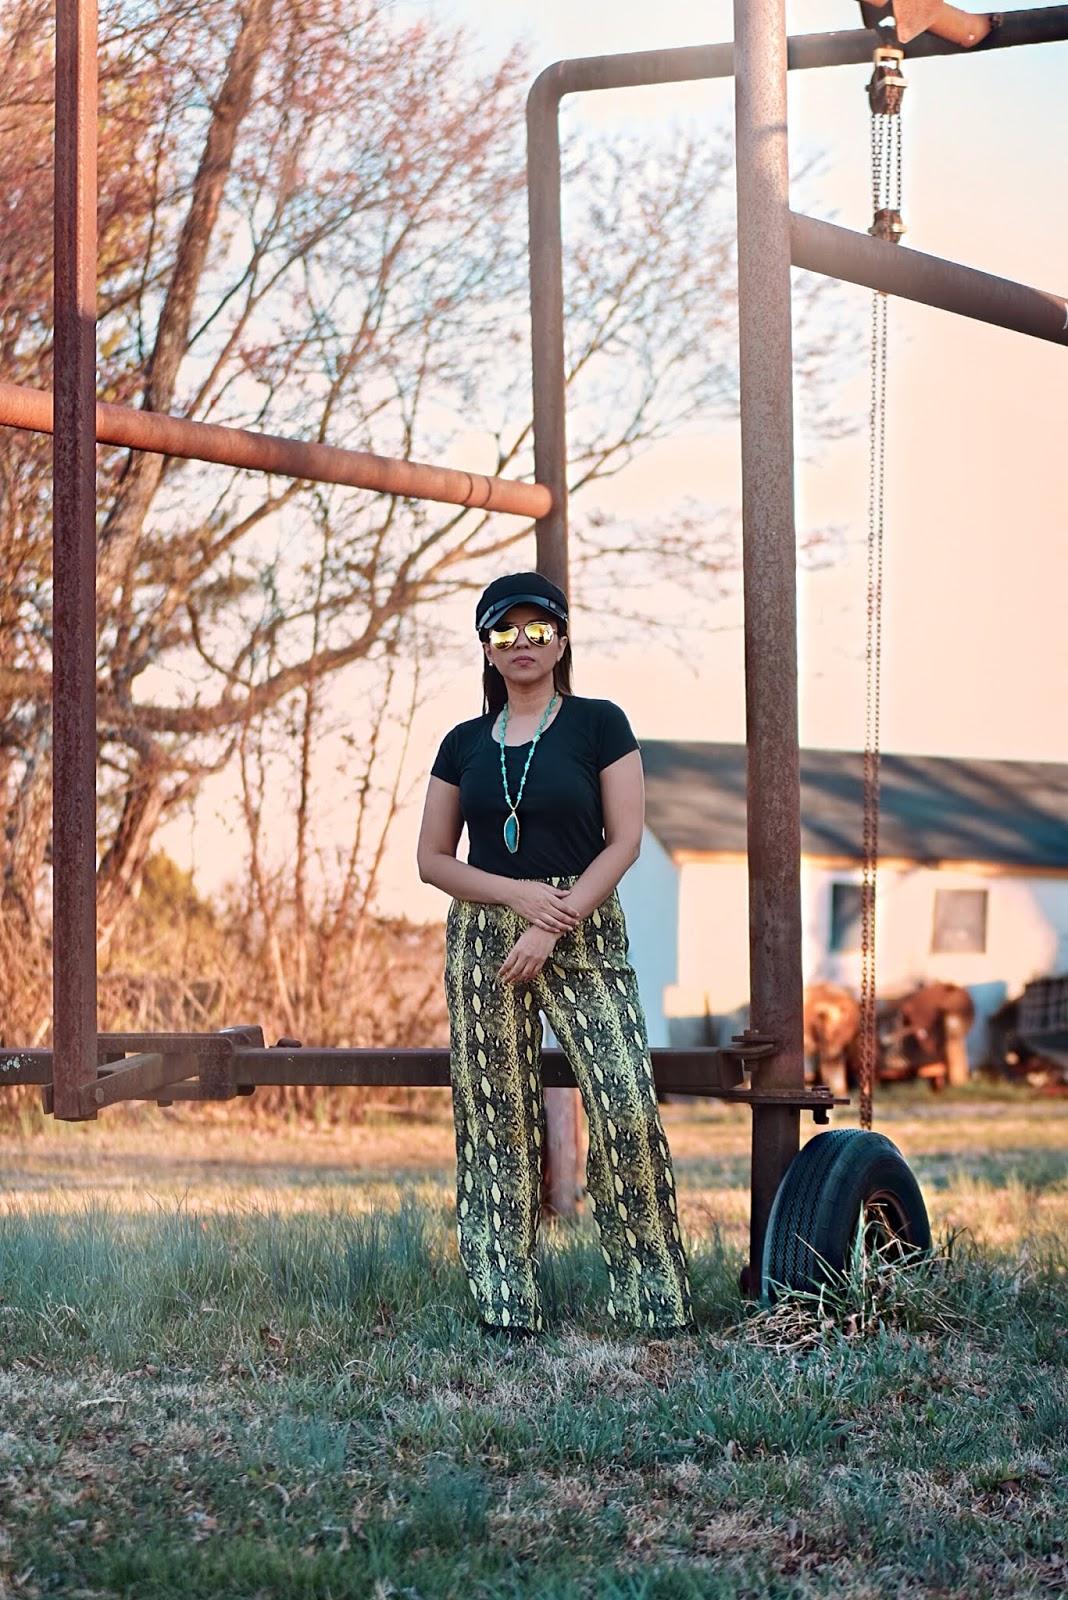 Neon Lime Snakeskin Straight Leg Pants-MariEstilo-SheInFestival-Coachella-festival mood-festival vibes-dcblogger-fashionblogger-snake print-snake print pants-boho chic-